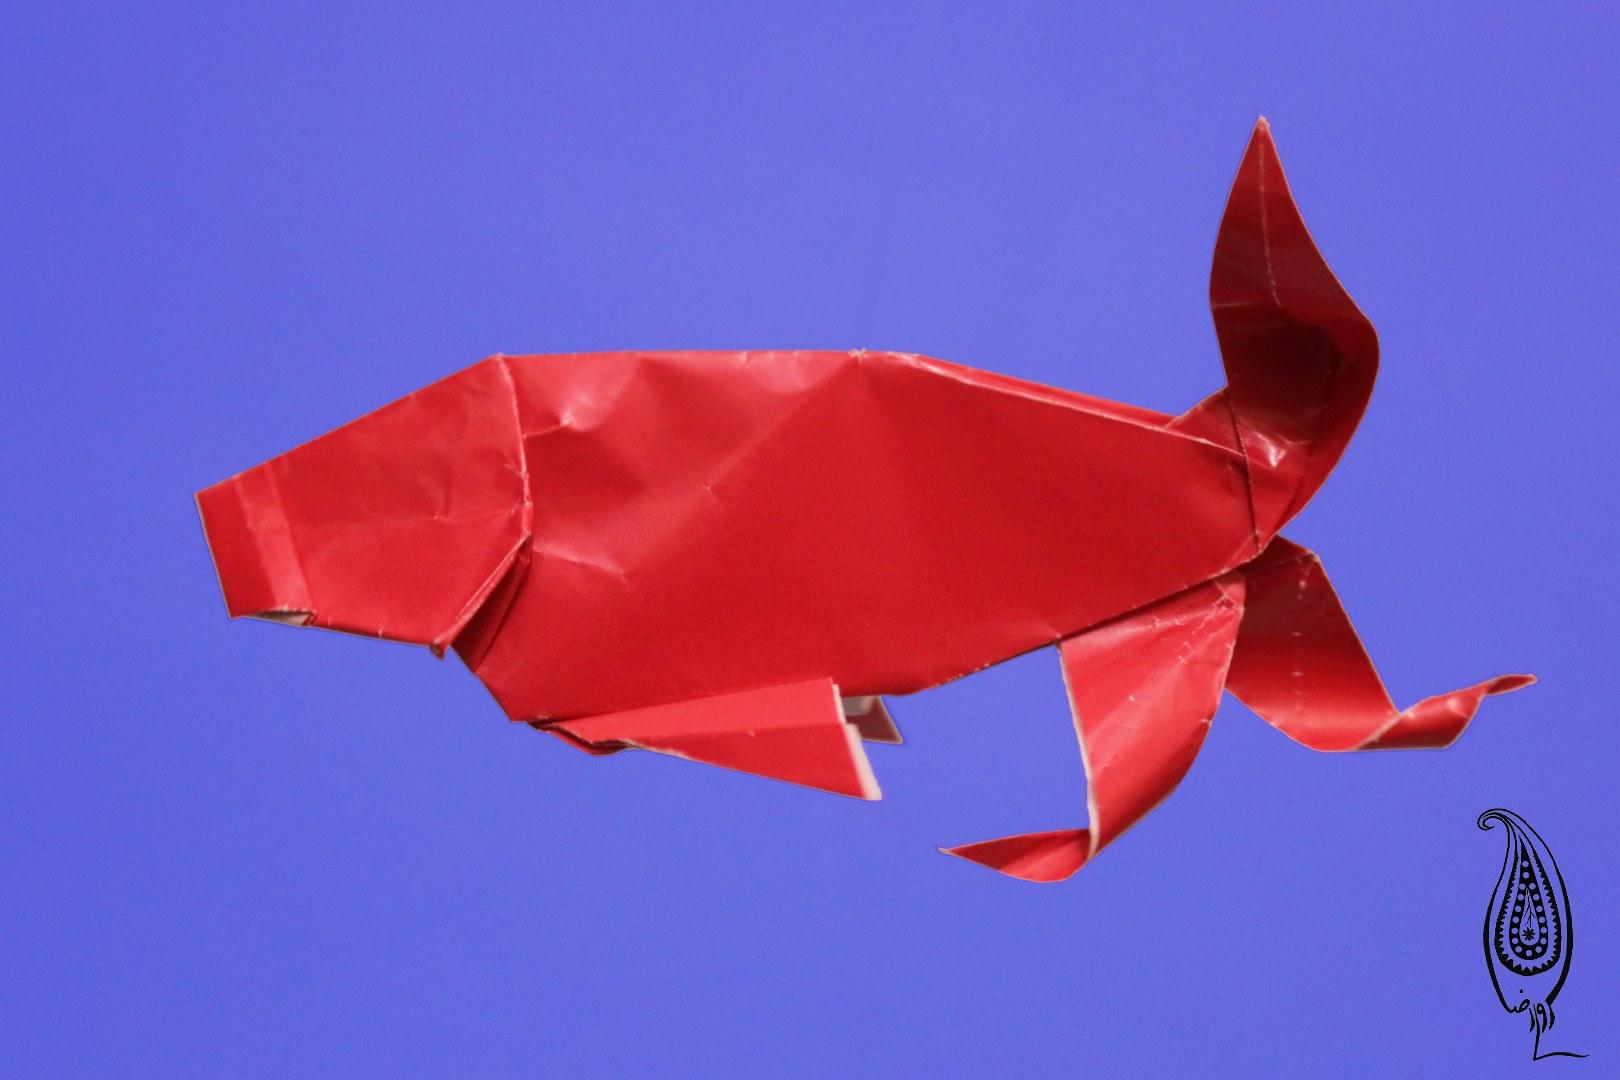 اوریگامی ماهی قرمز